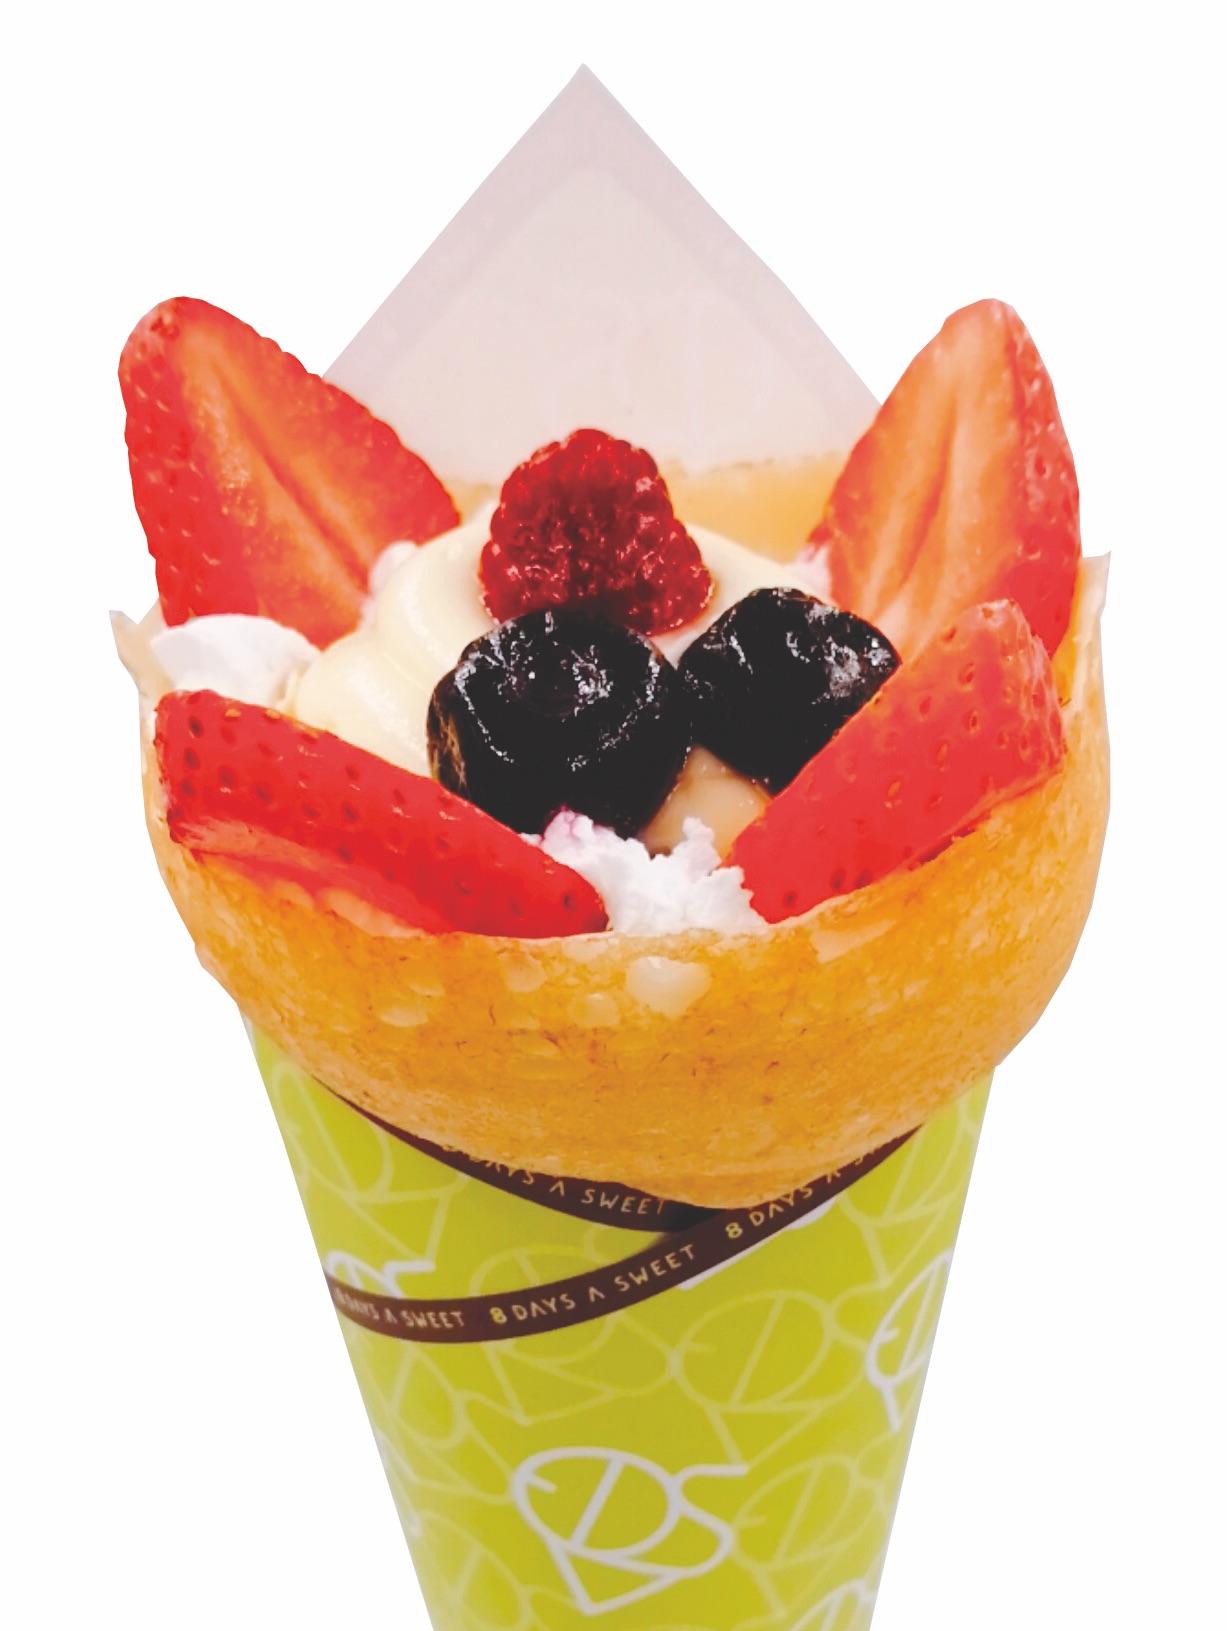 %e3%81%95%e3%82%93%e3%81%a0%e3%81%84%e3%81%a1%e3%81%94-strawberry-desserts-%e8%8d%89%e8%8e%93%e7%94%9c%e9%bb%9e-4